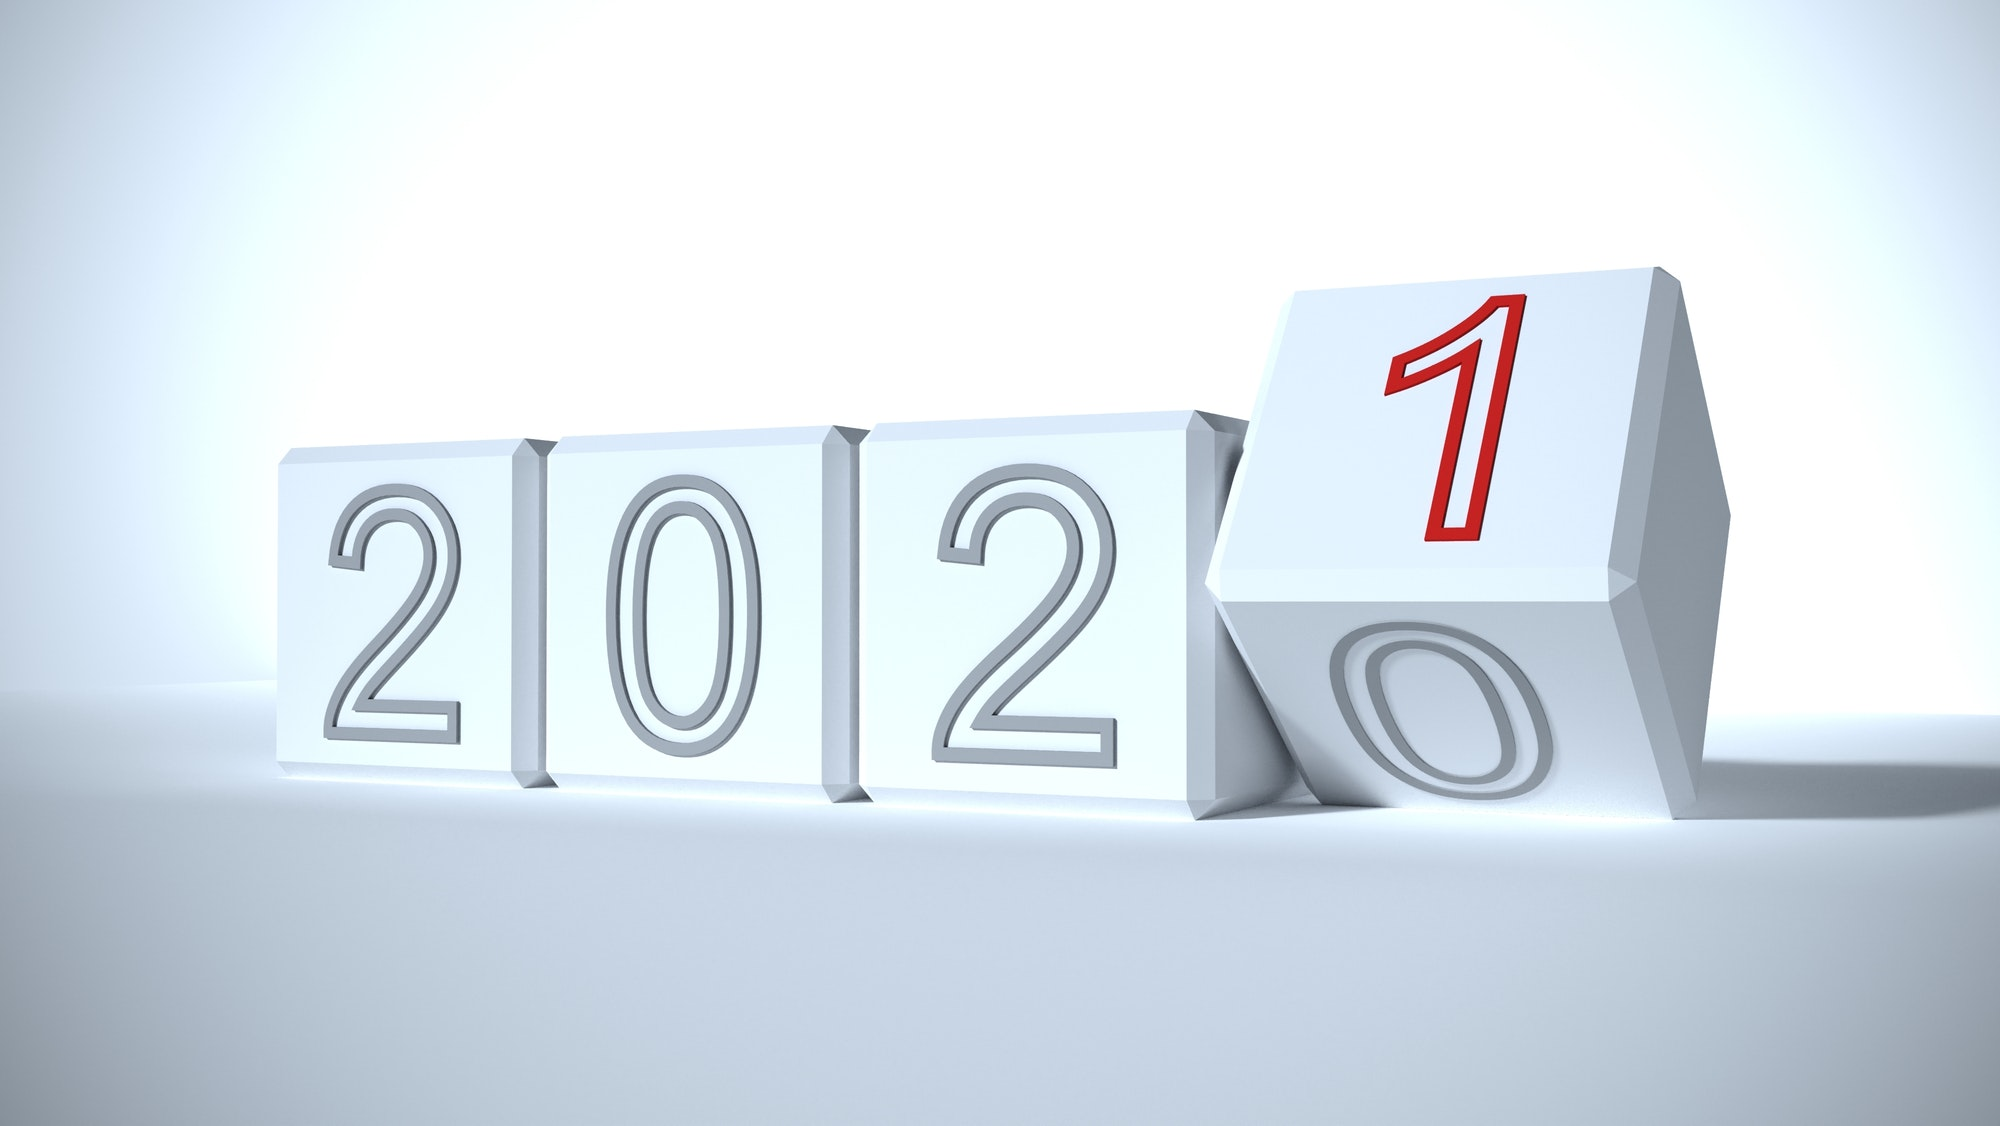 2021 white blocks New year change, turn. 2021 start and 2020. 3D rendering